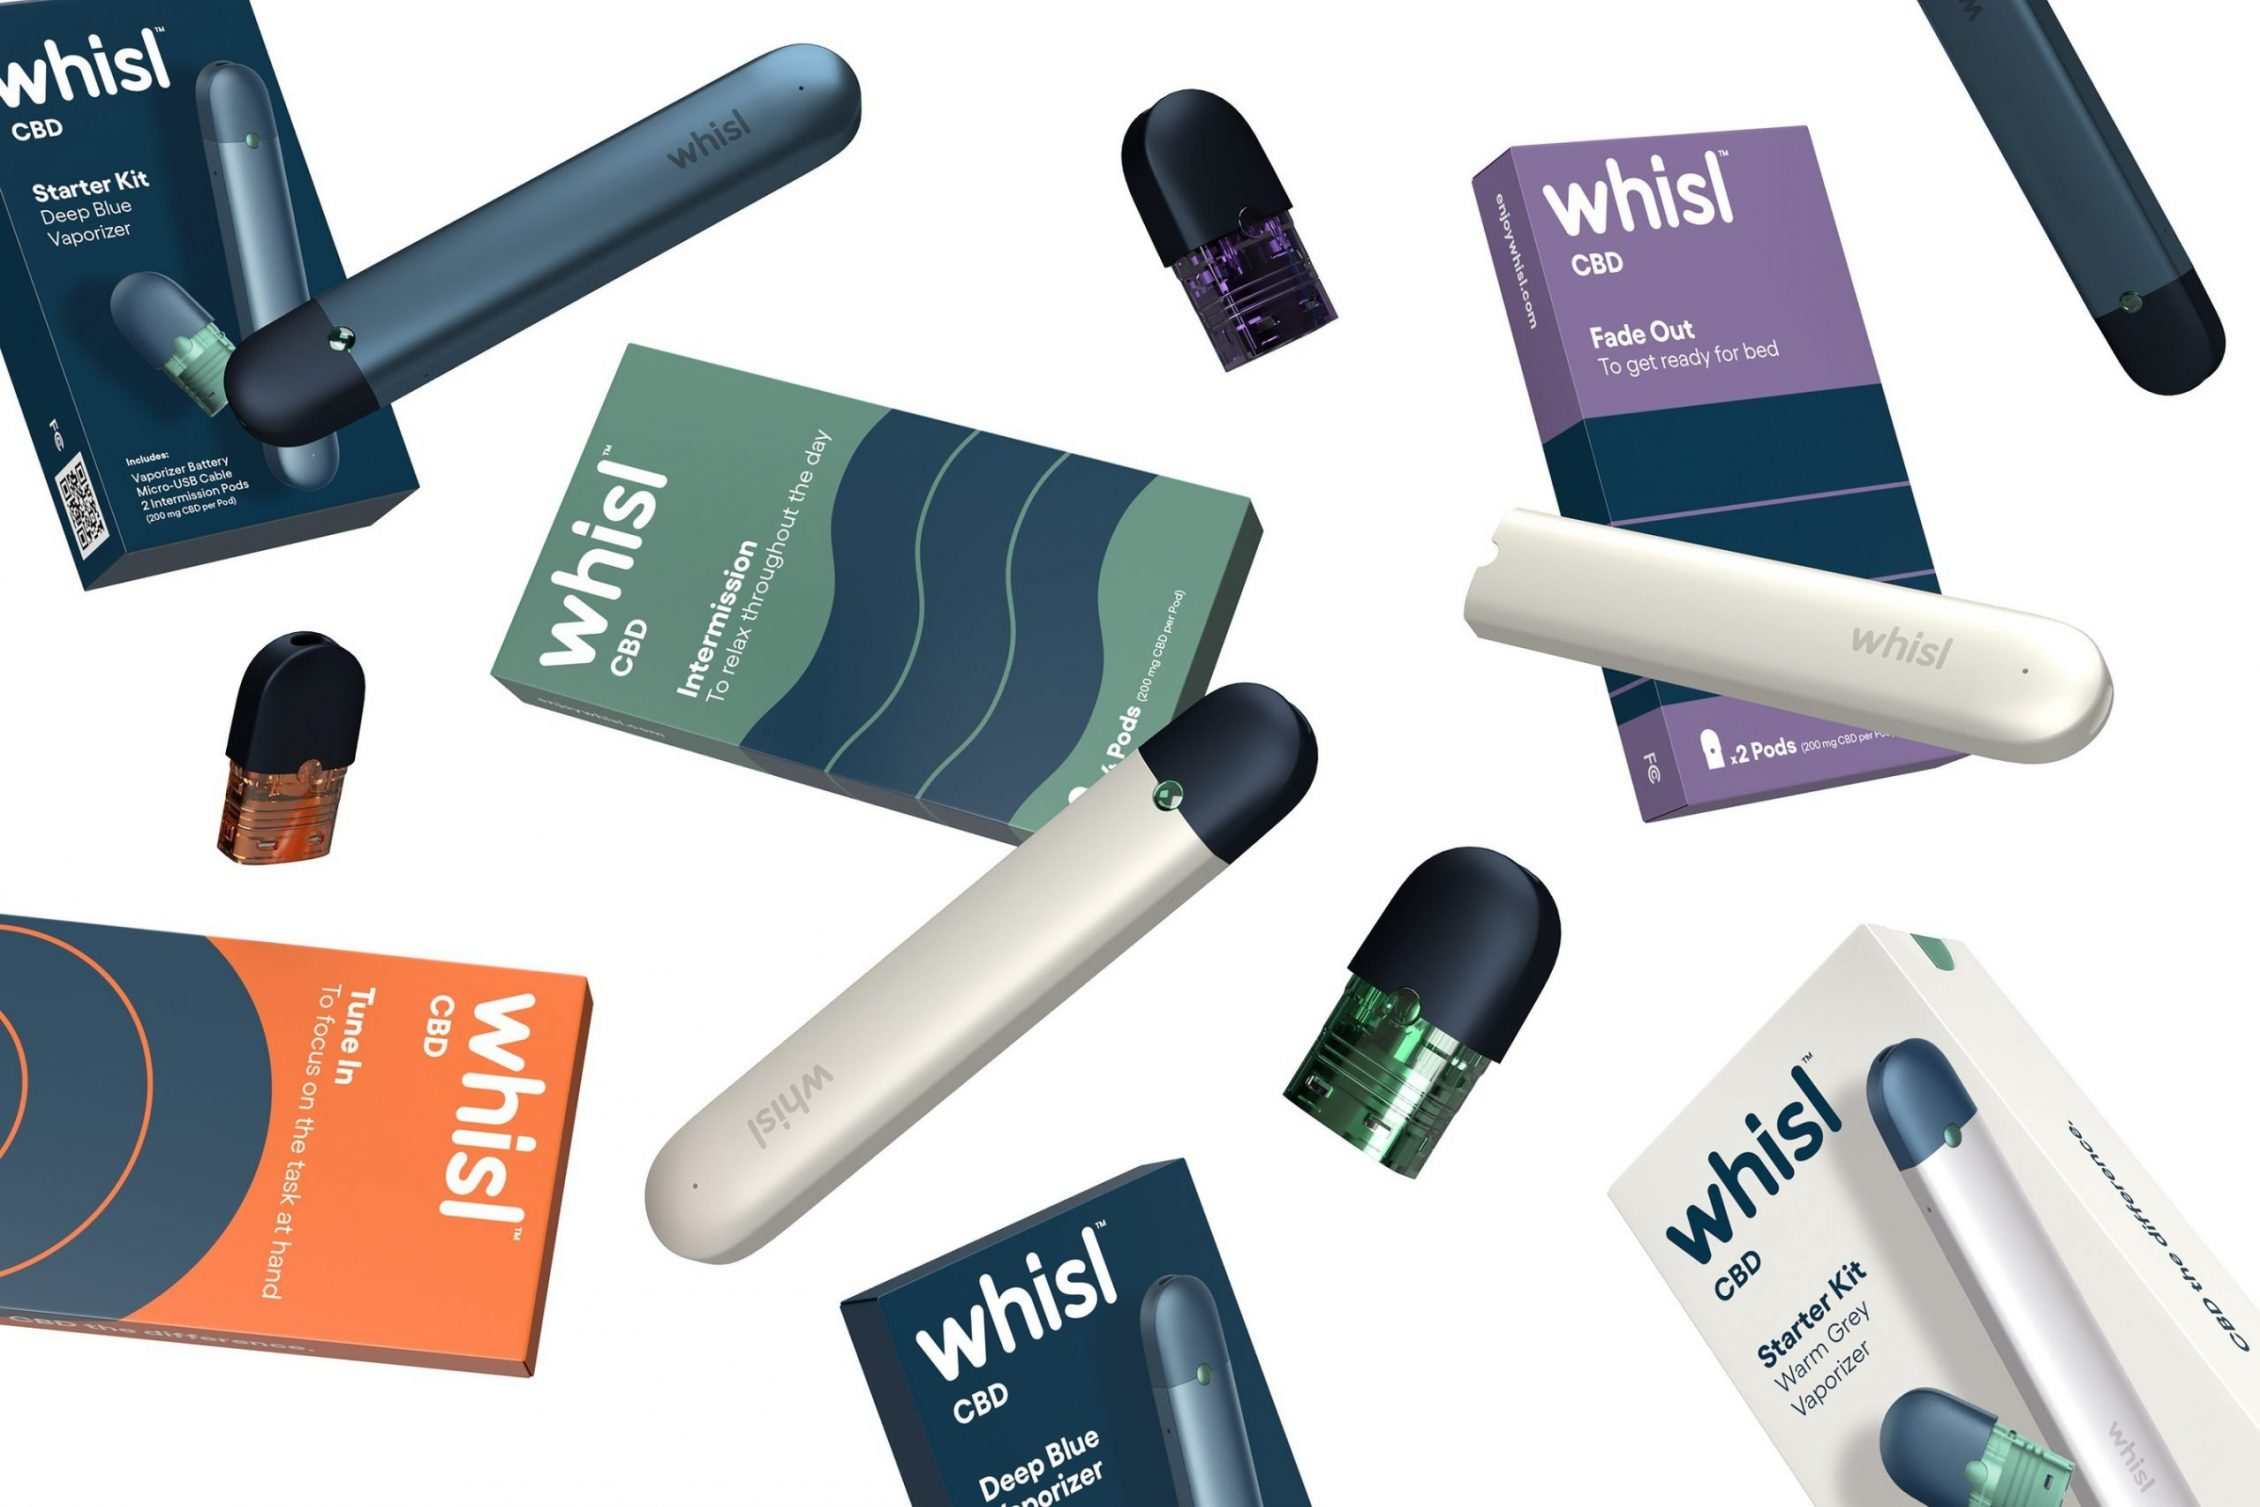 Canopy Growth Corporation-Introducing whisl- an Innovative CBD V